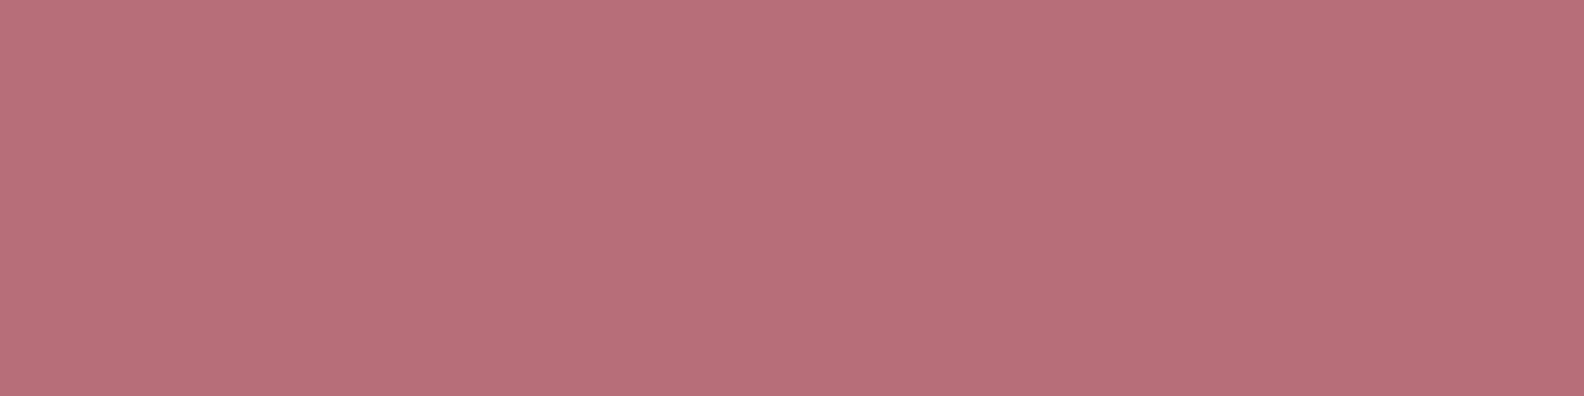 1584x396 Rose Gold Solid Color Background